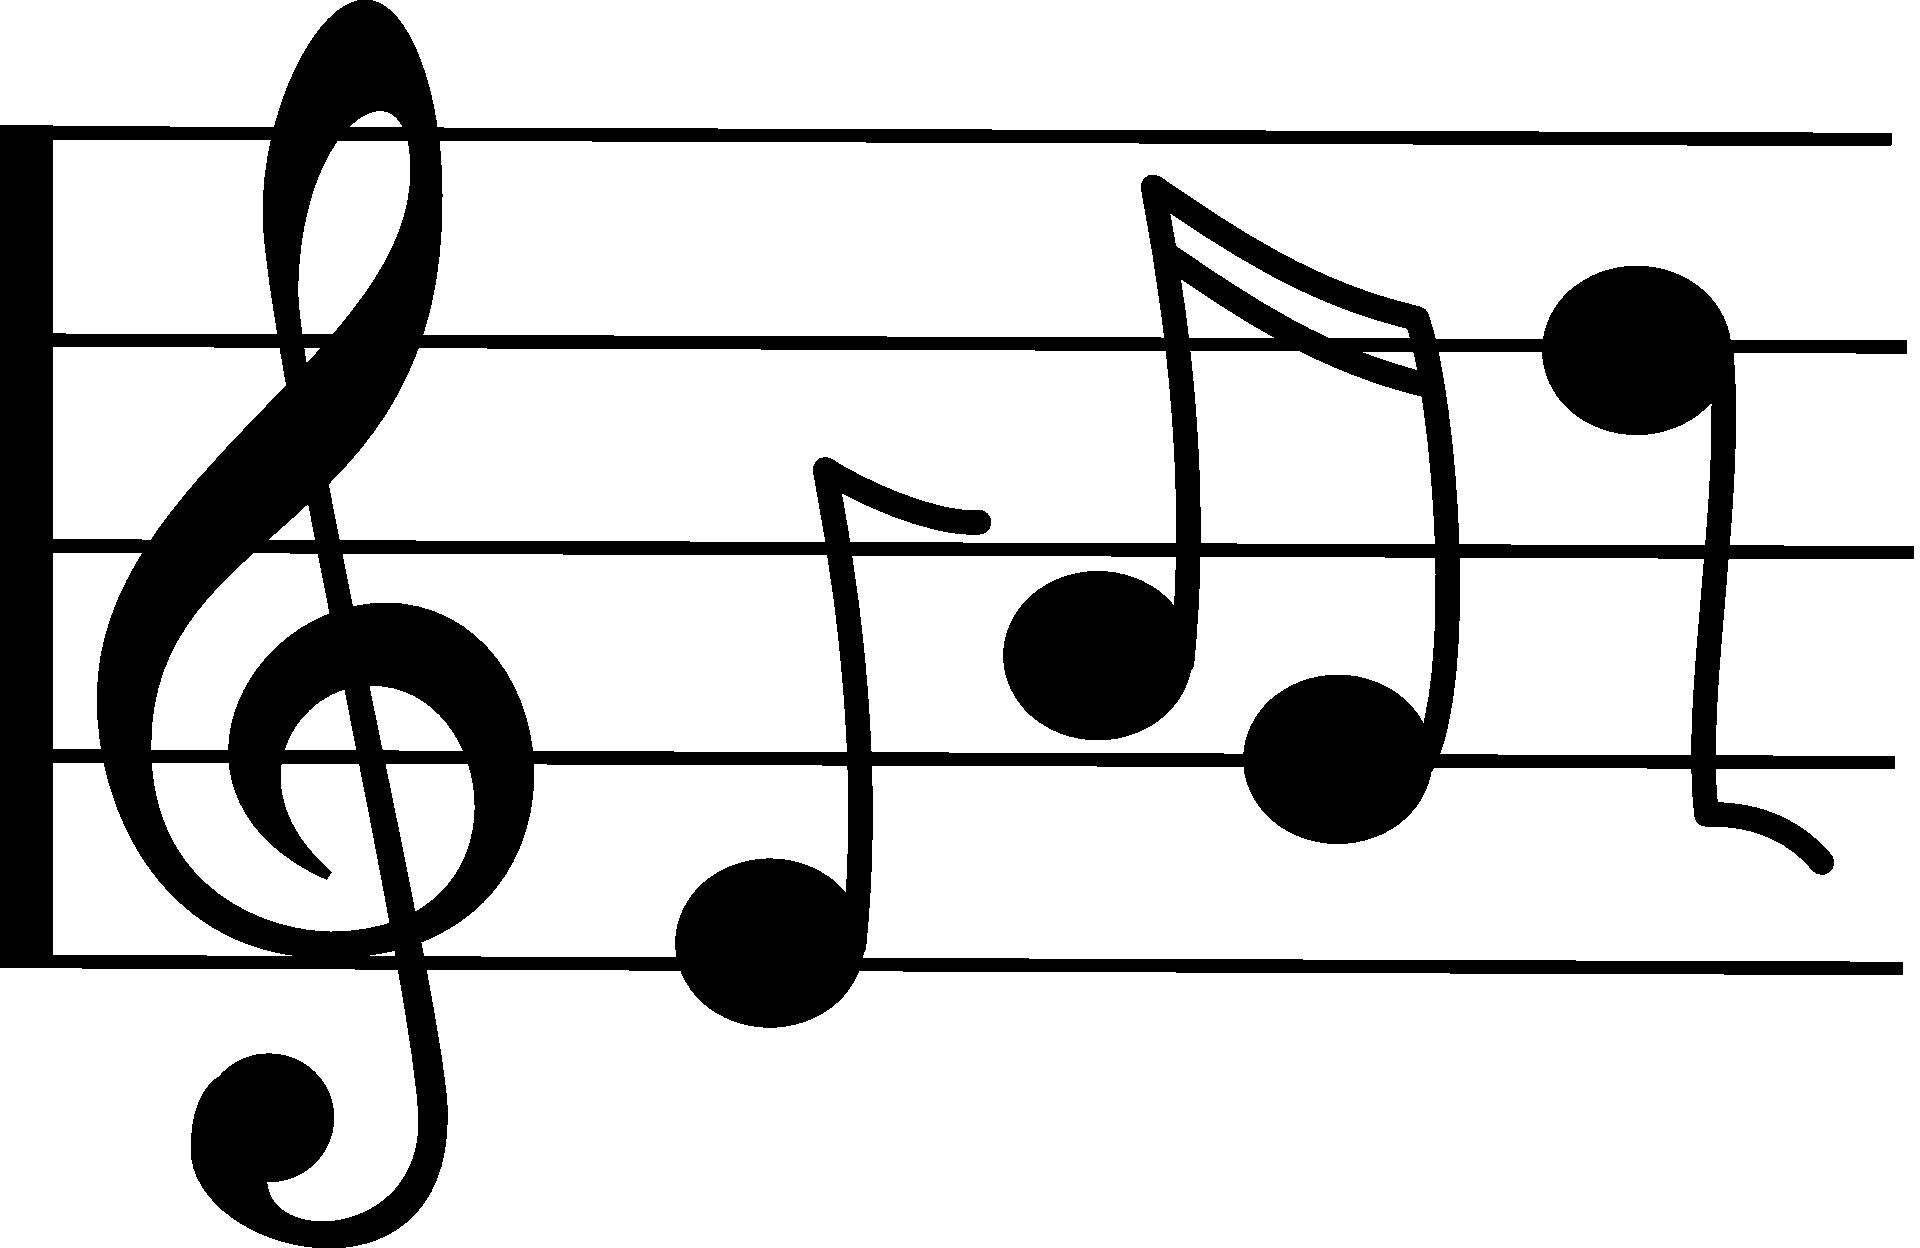 Music Notes Symbols Drawing Free Image